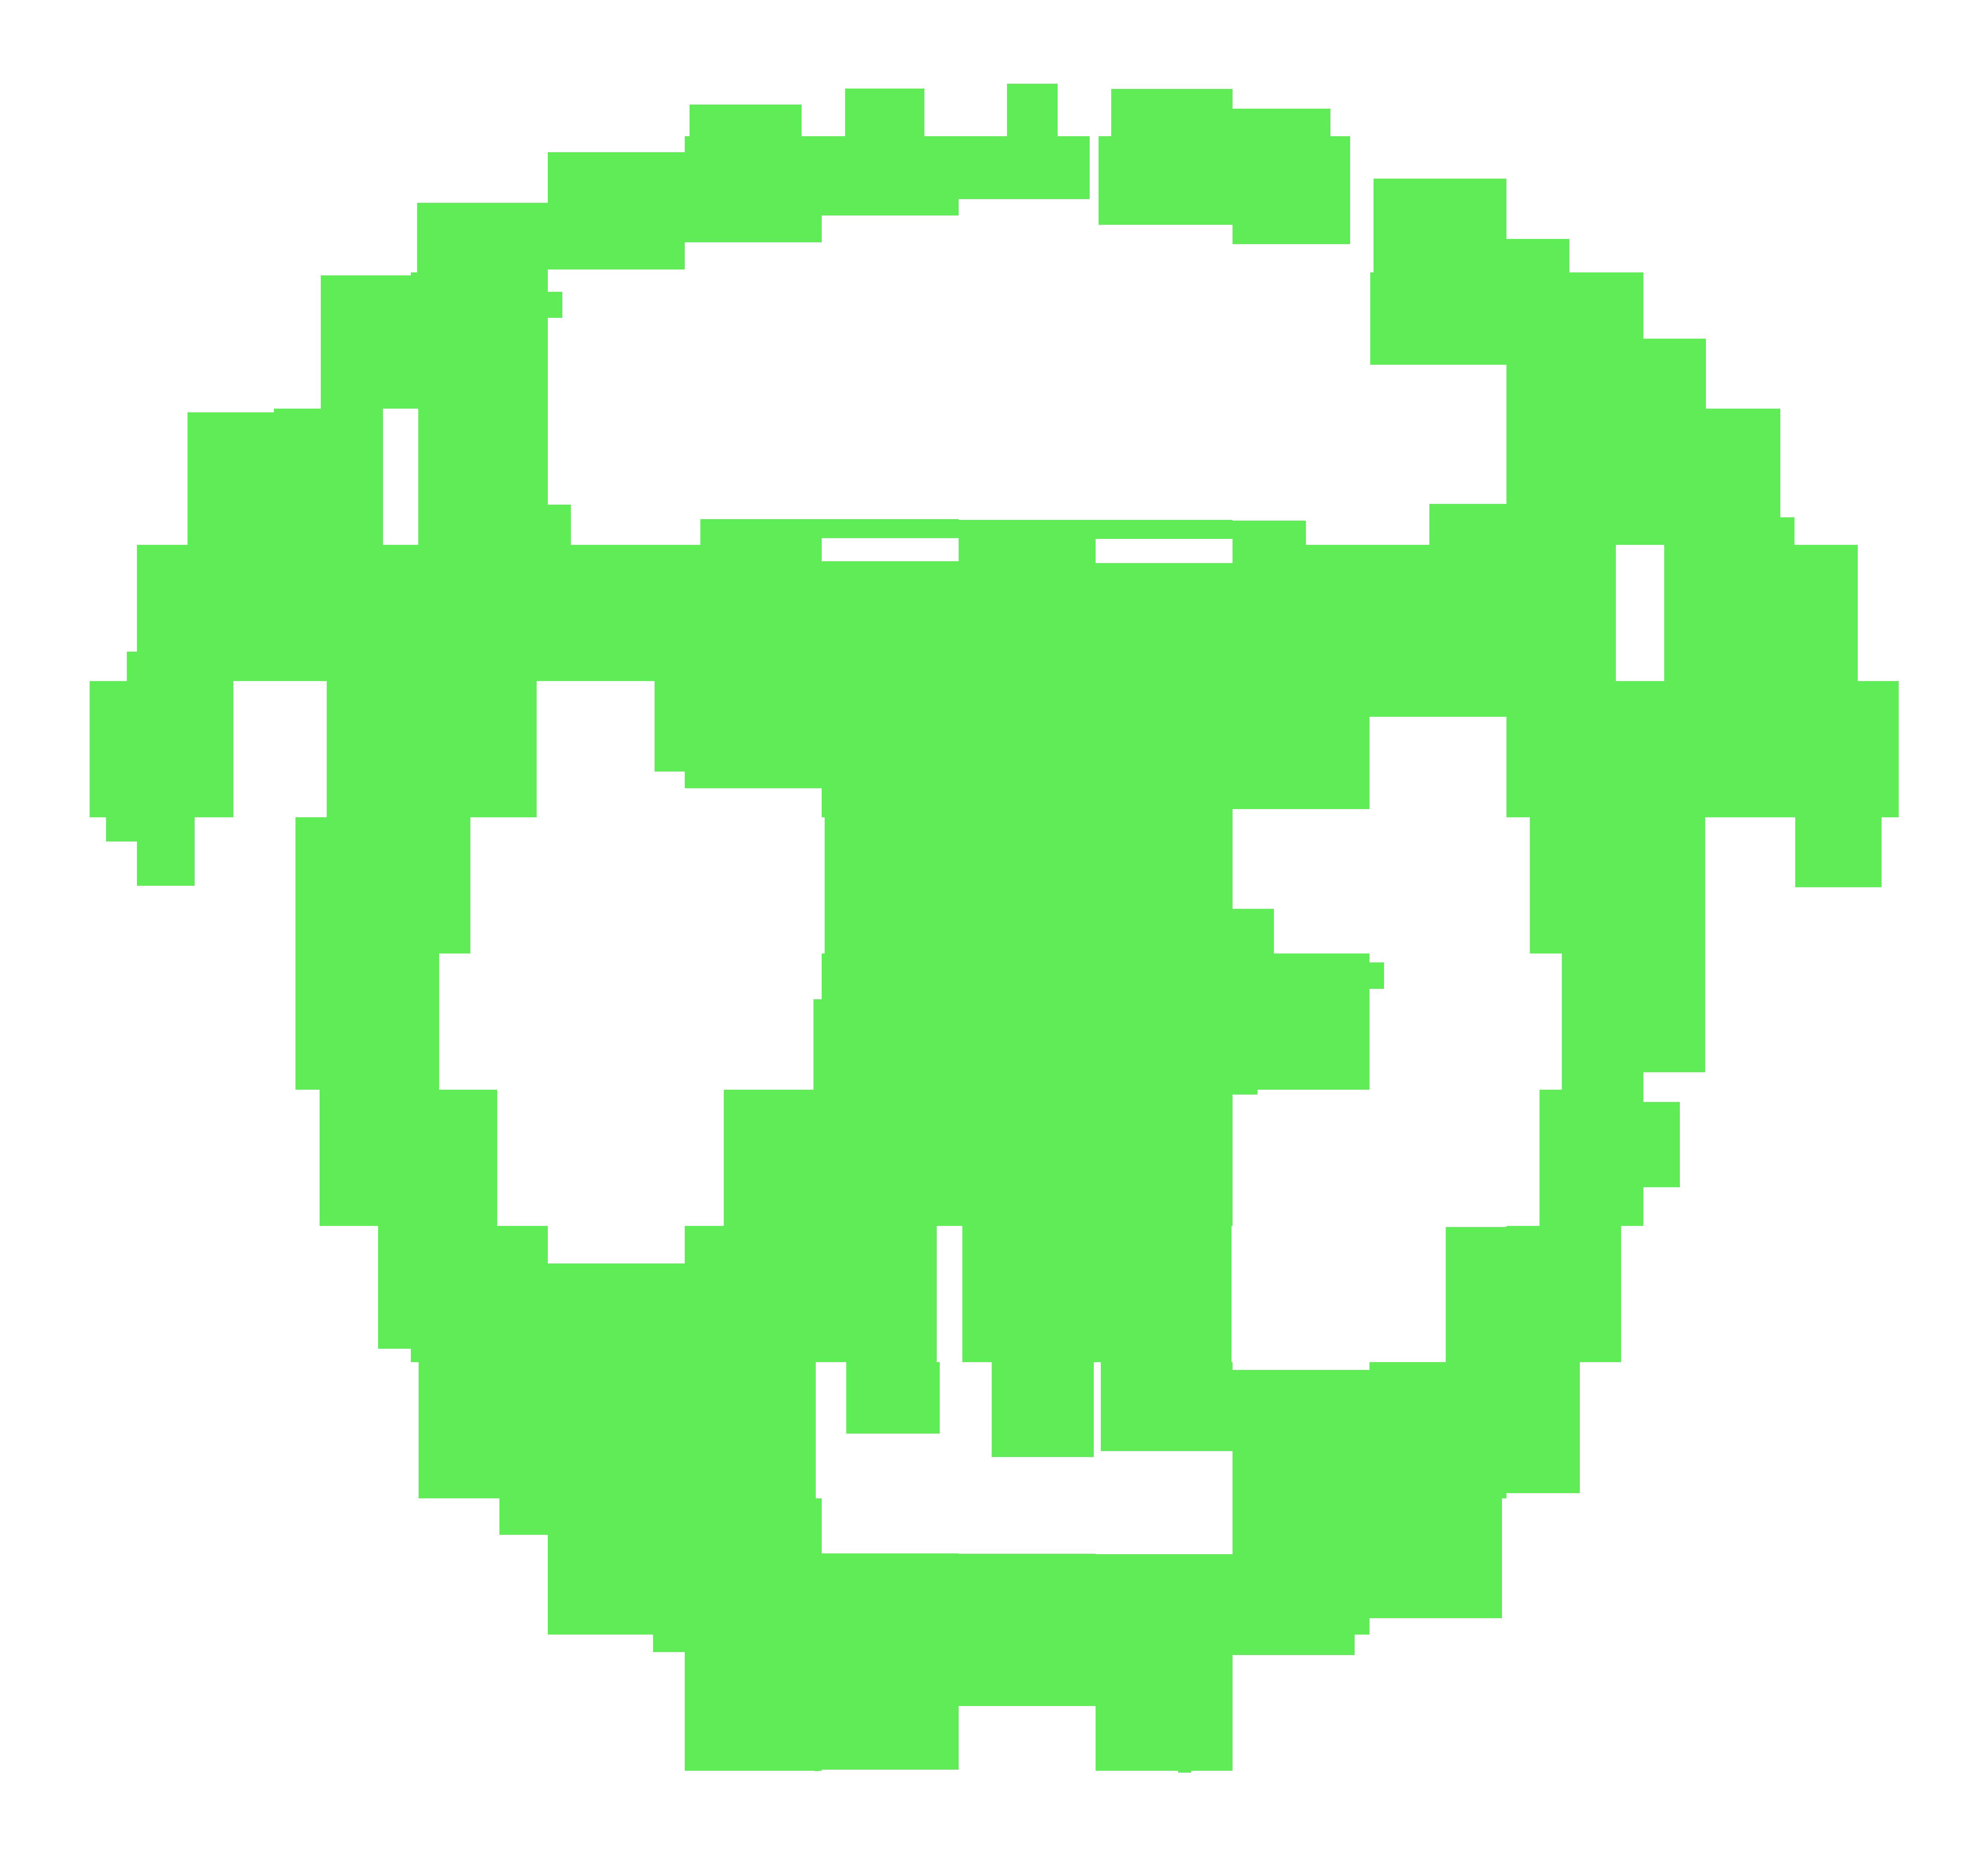 Asociación de Atletas Populares de Mérida